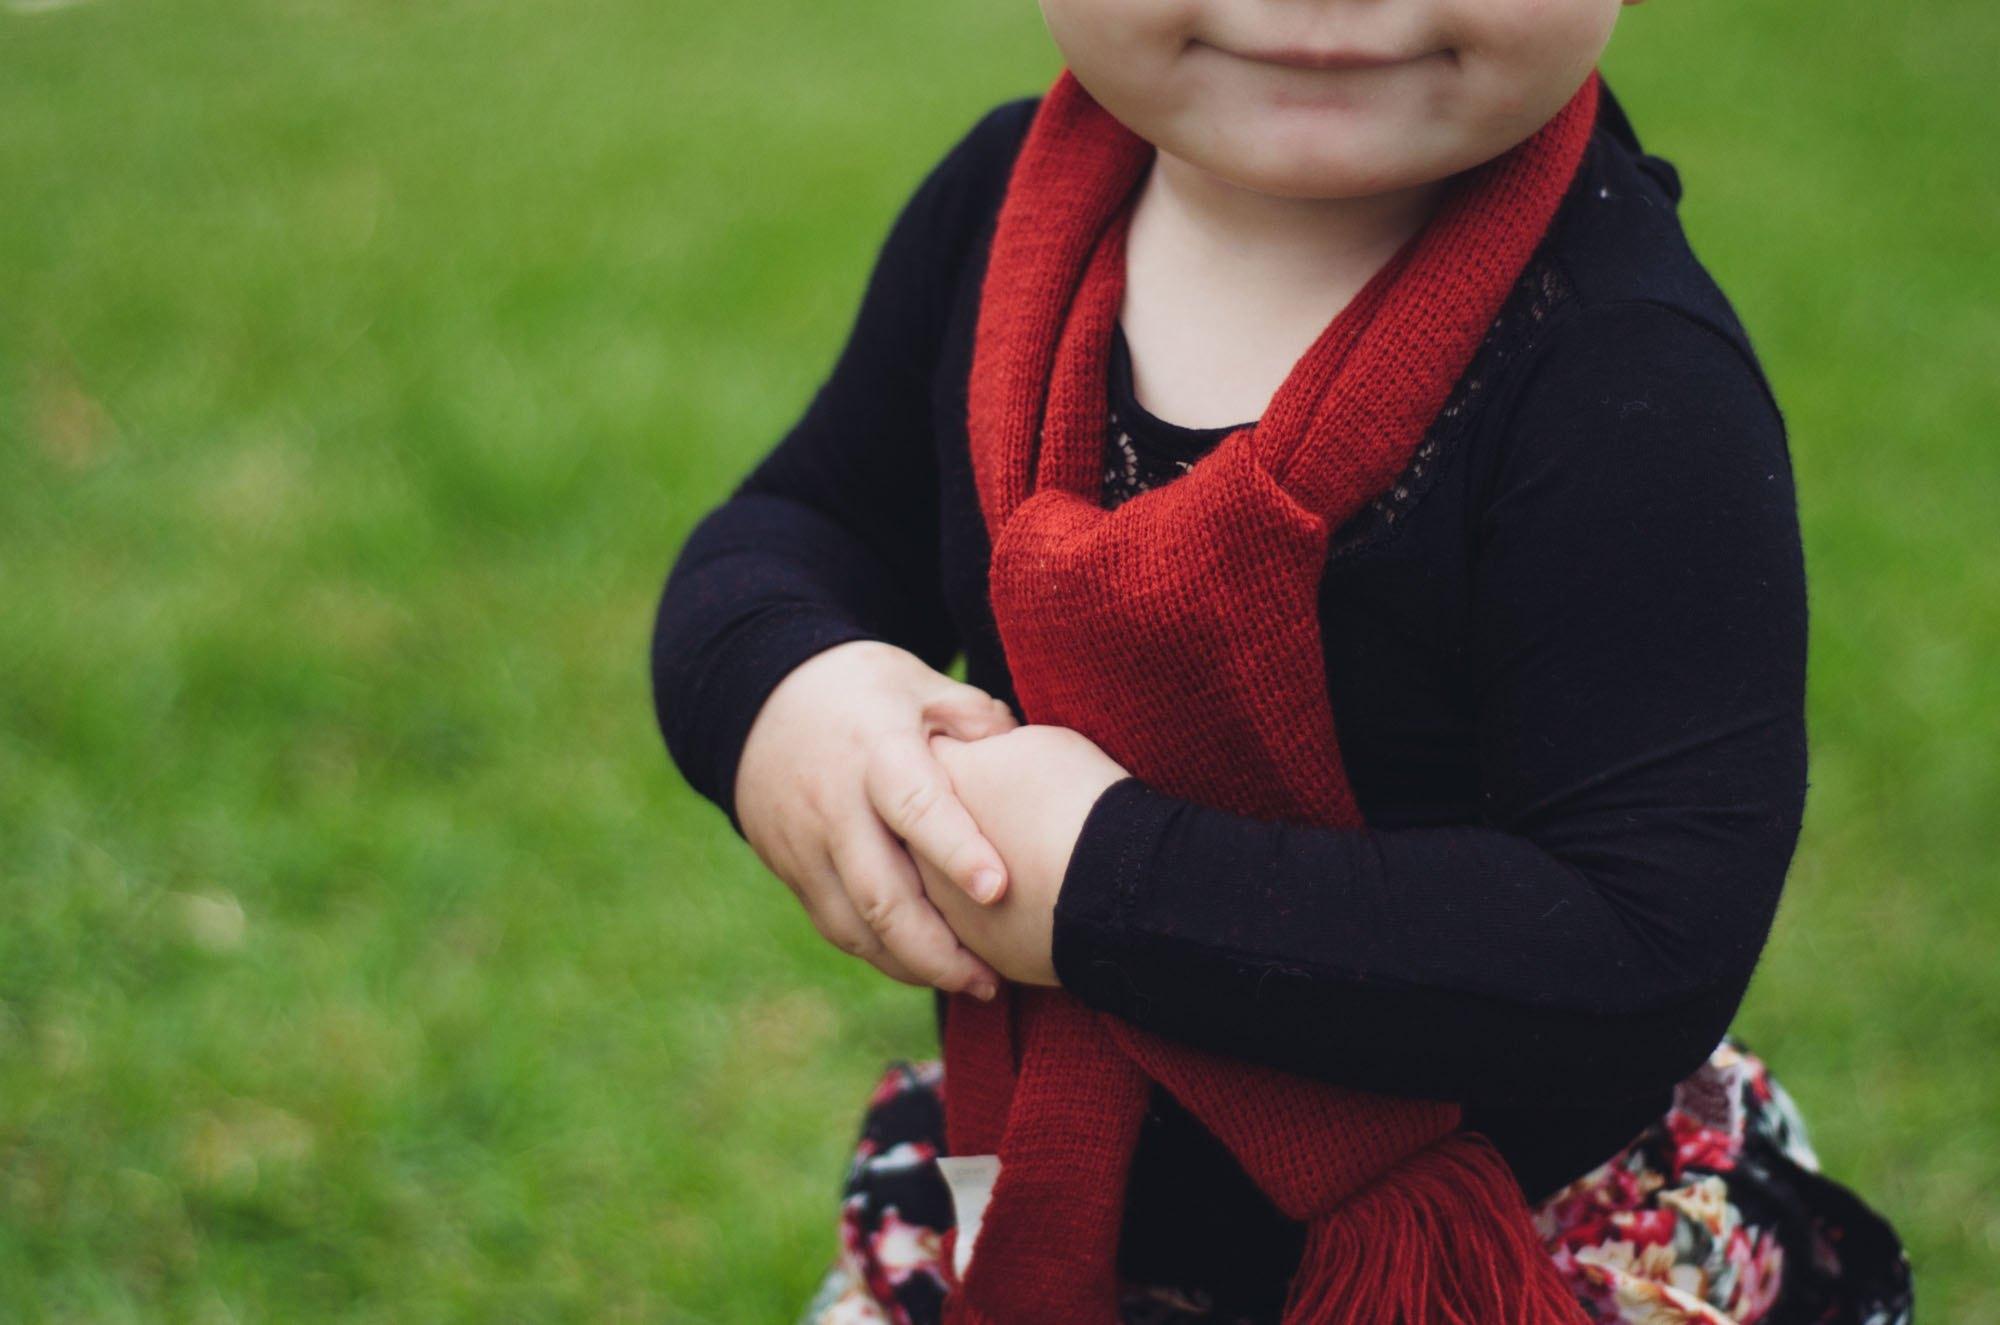 Maria-Eva-ensaio-infantil-ubatuba-sp-30-06-16-26